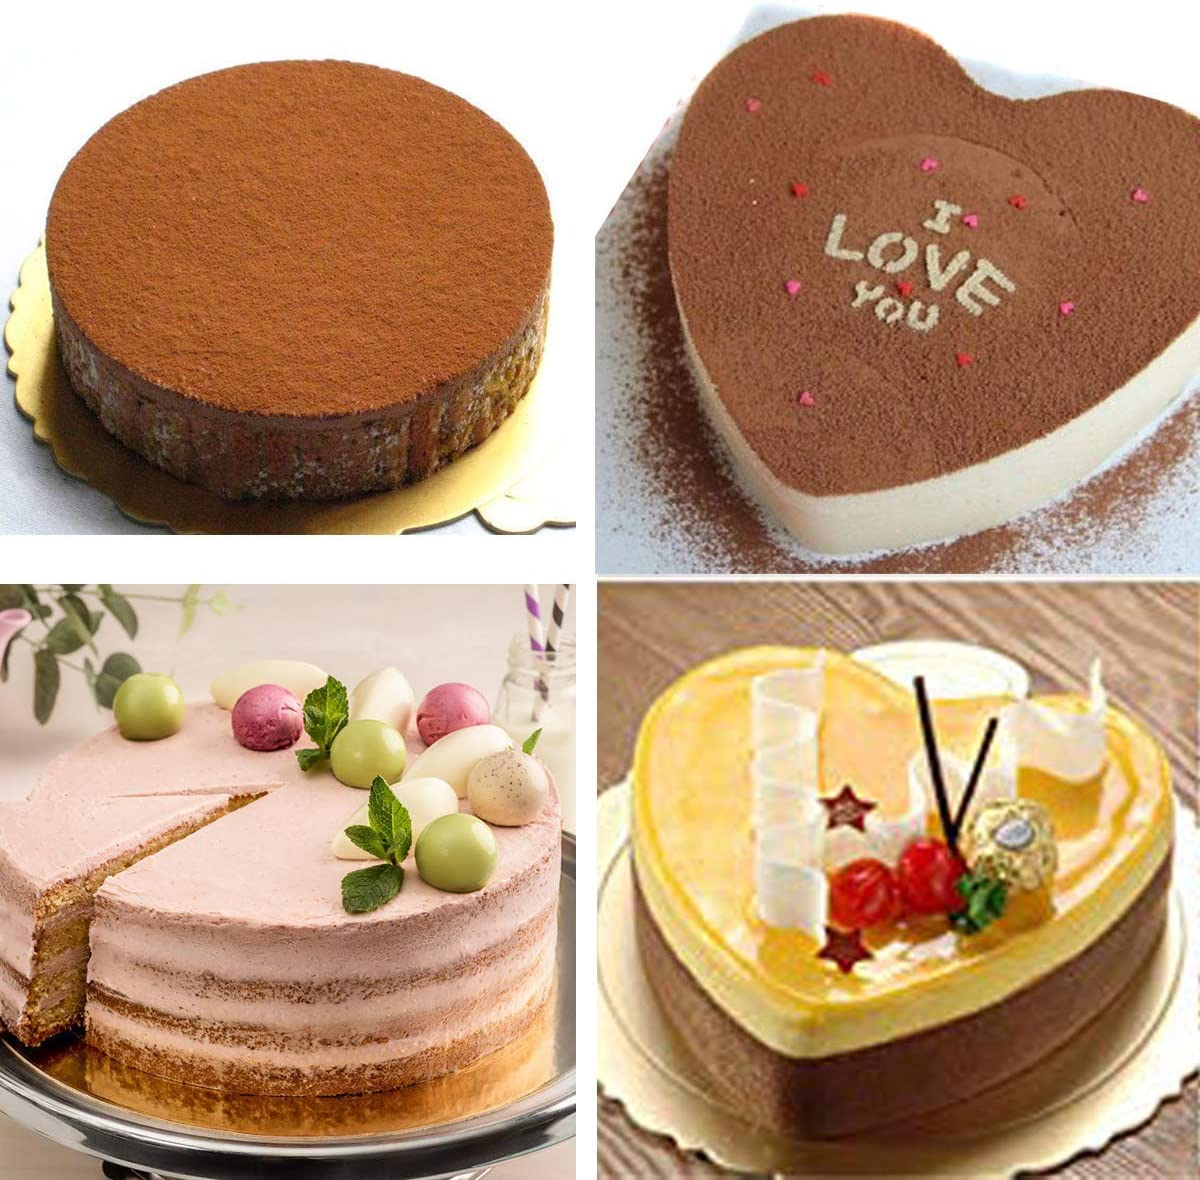 Backform Silikon Herzform Kuchen backen Torte Brot Form